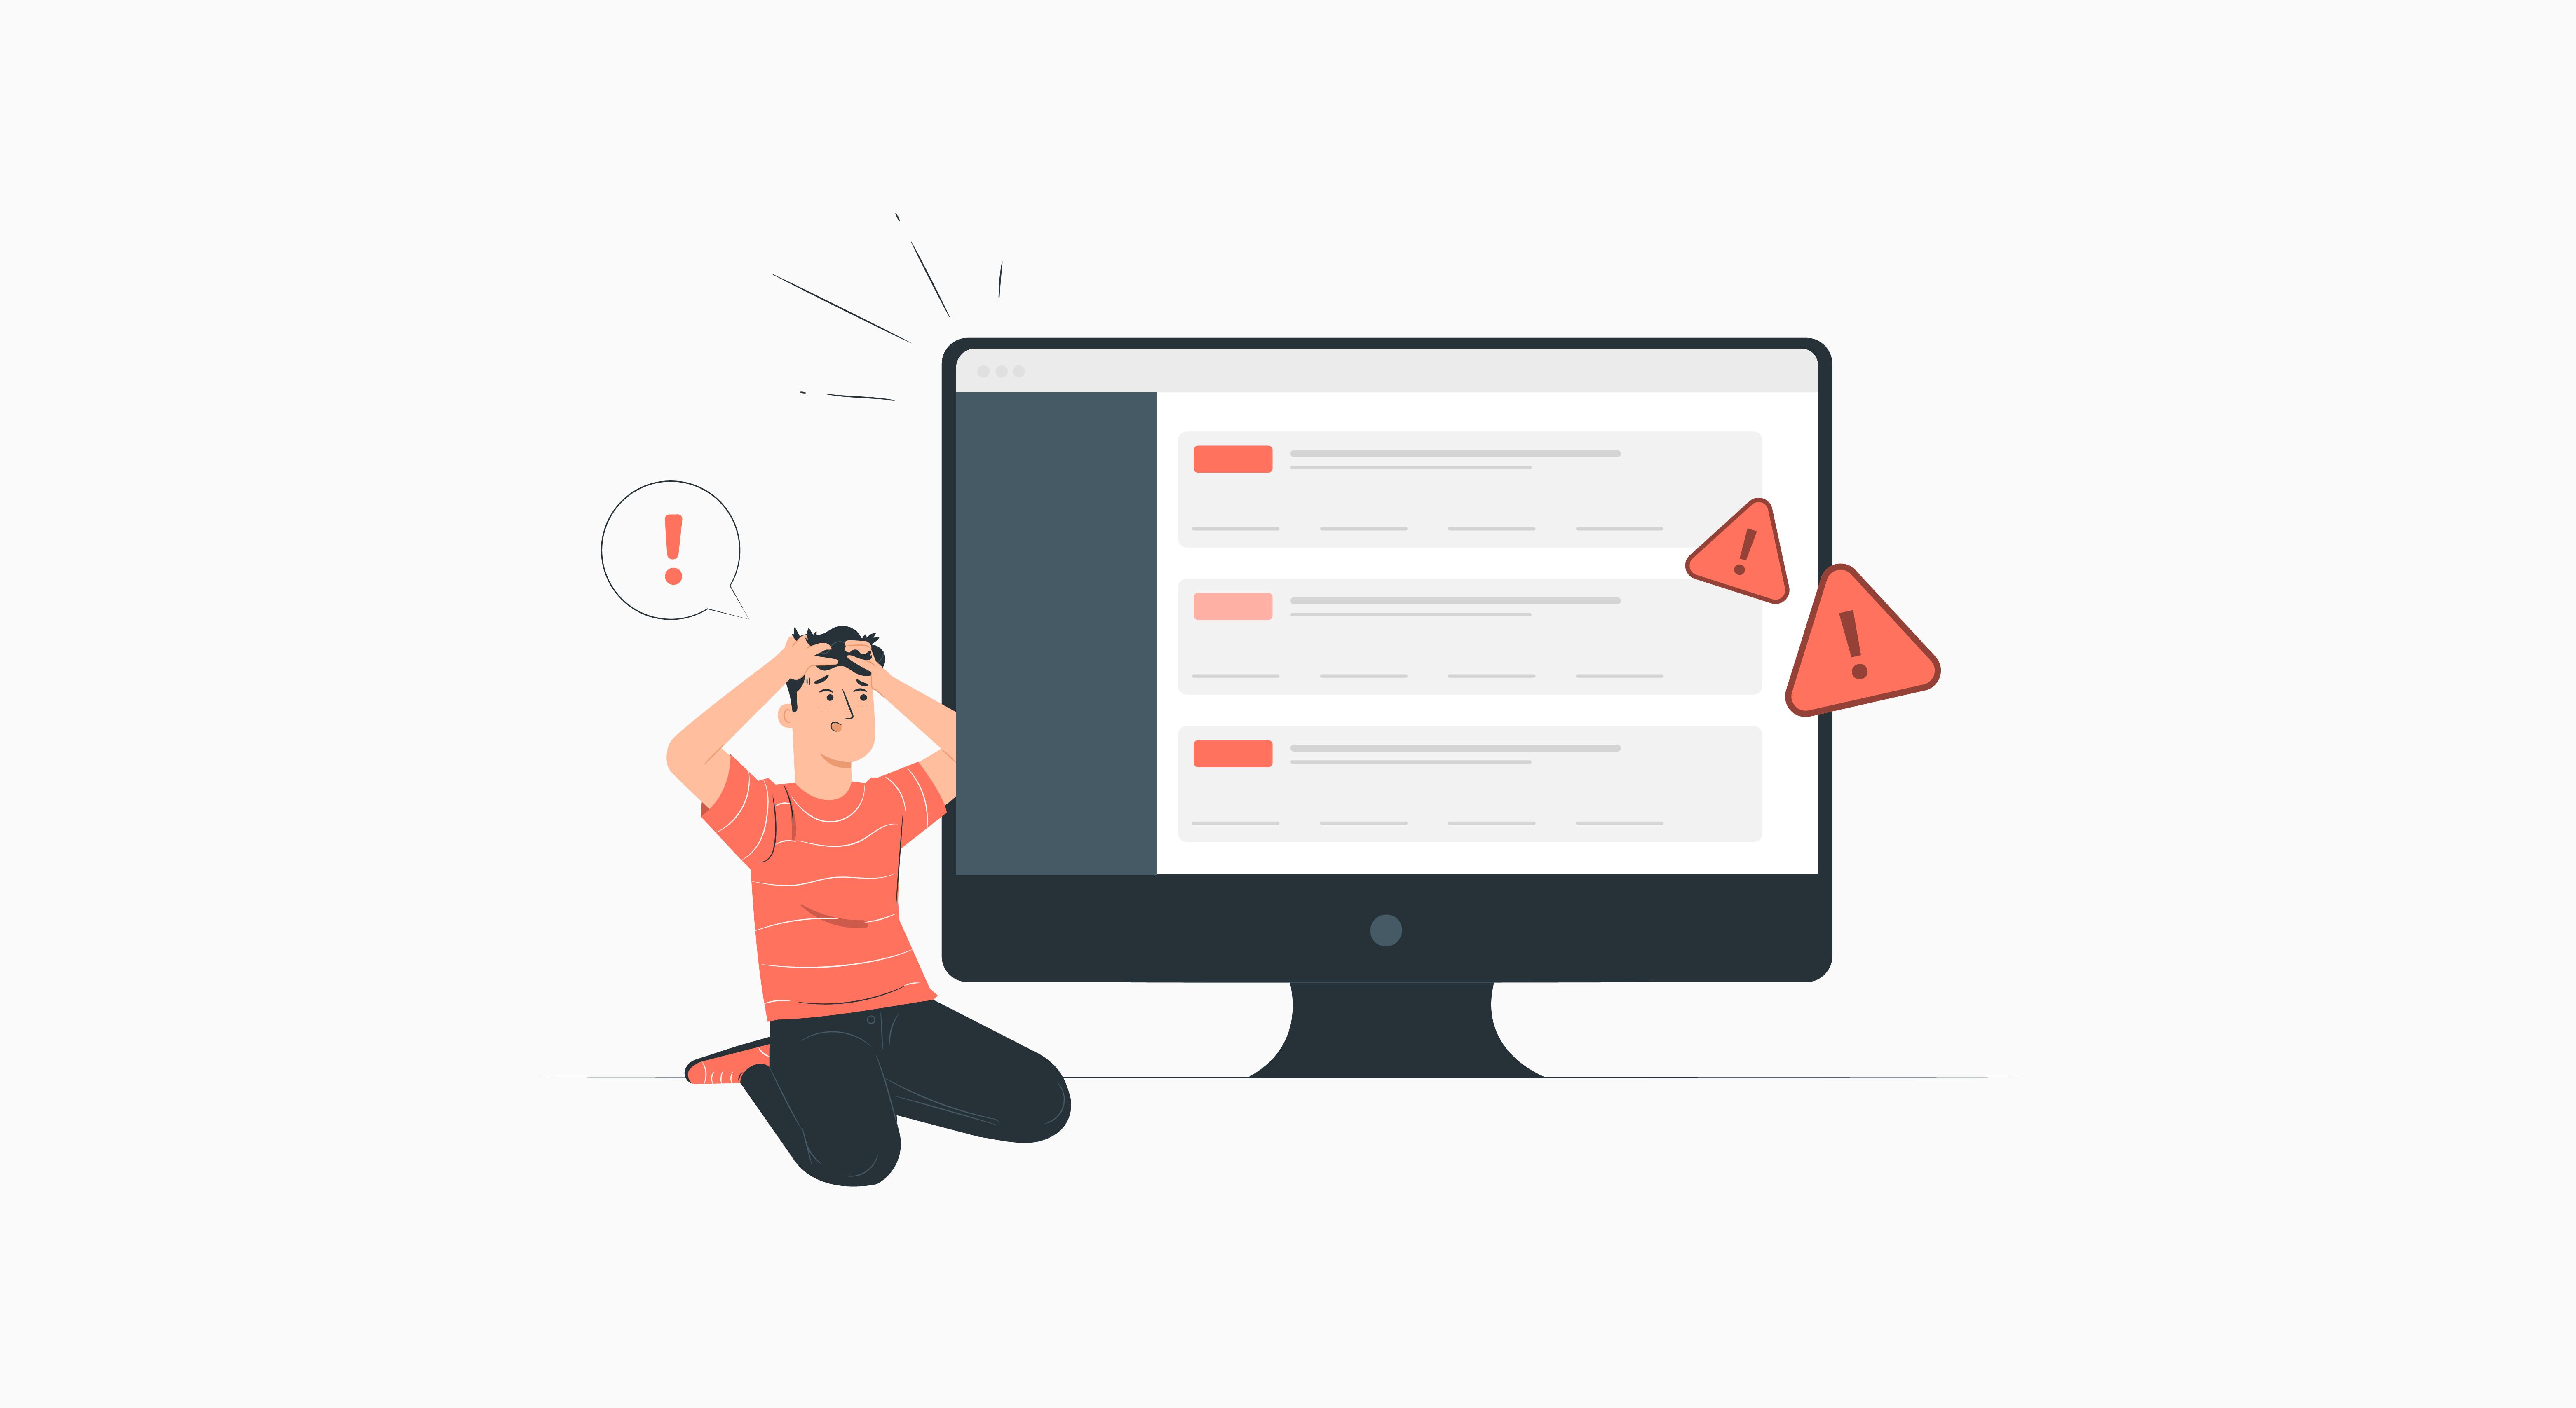 5 Signs You Should Change Your Service Desk